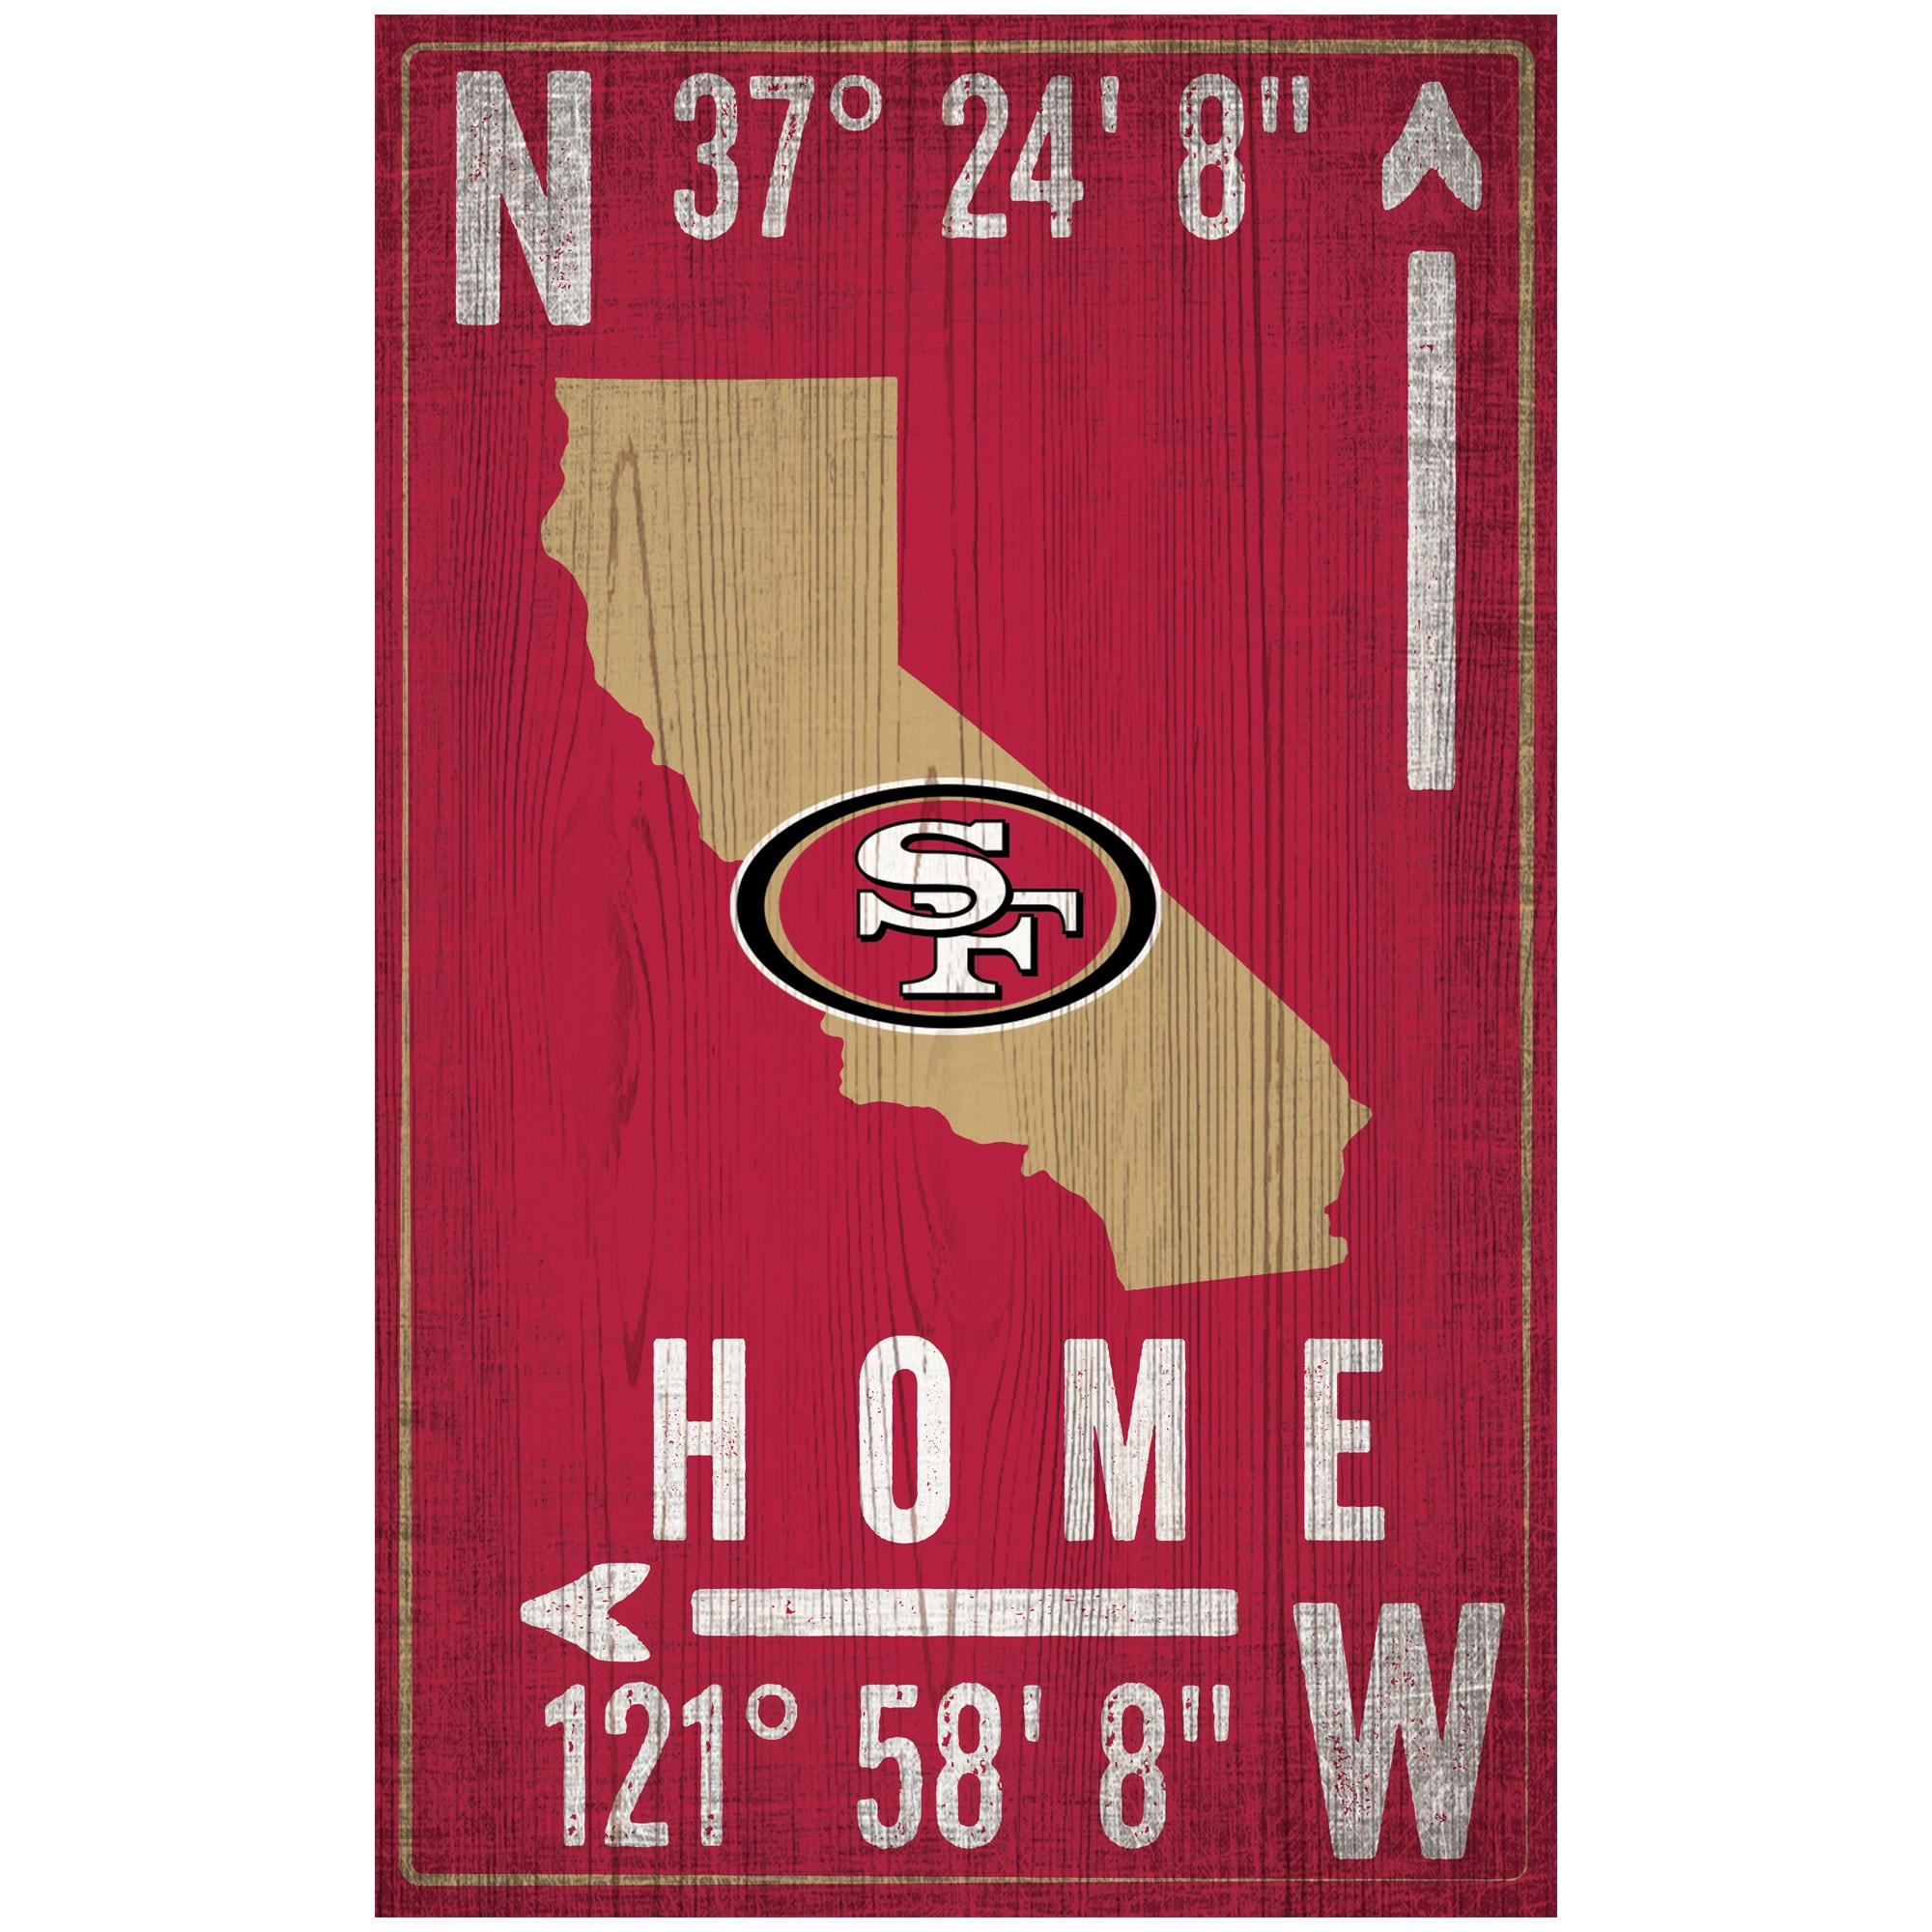 "San Francisco 49ers 11"" x 19"" Coordinate Sign"